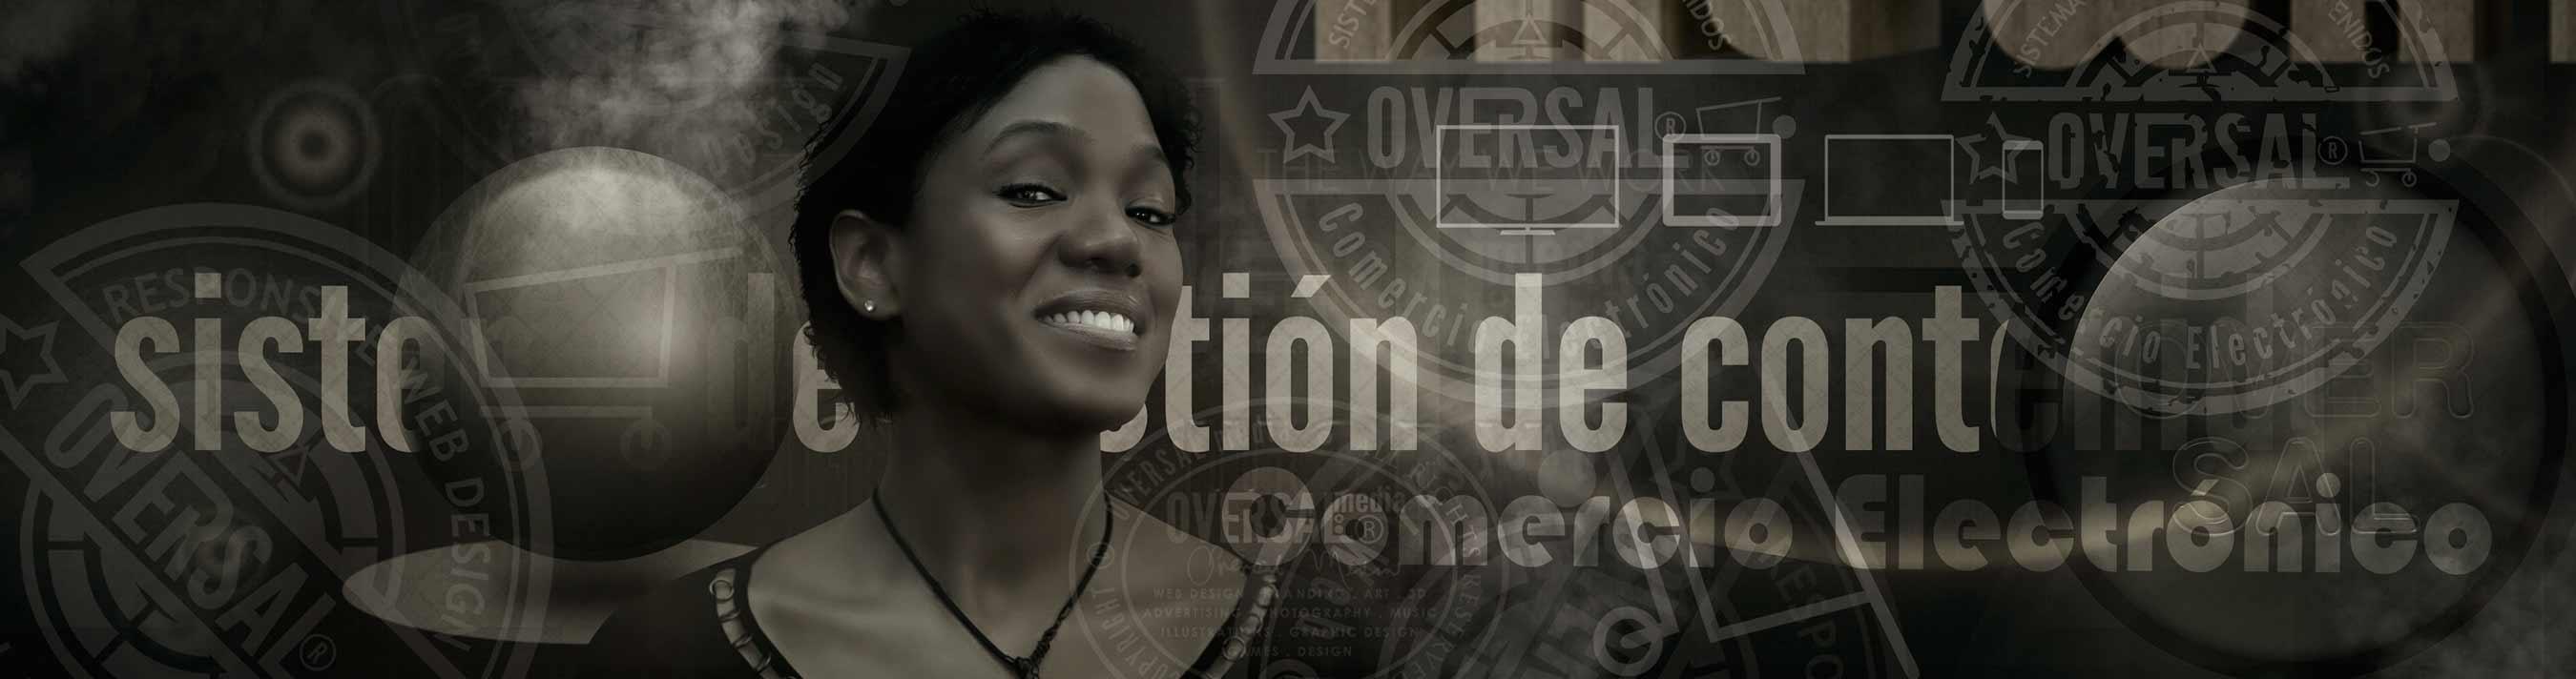 Smiling woman and futuristic surrounding - Elimina tu competencia - Oversal